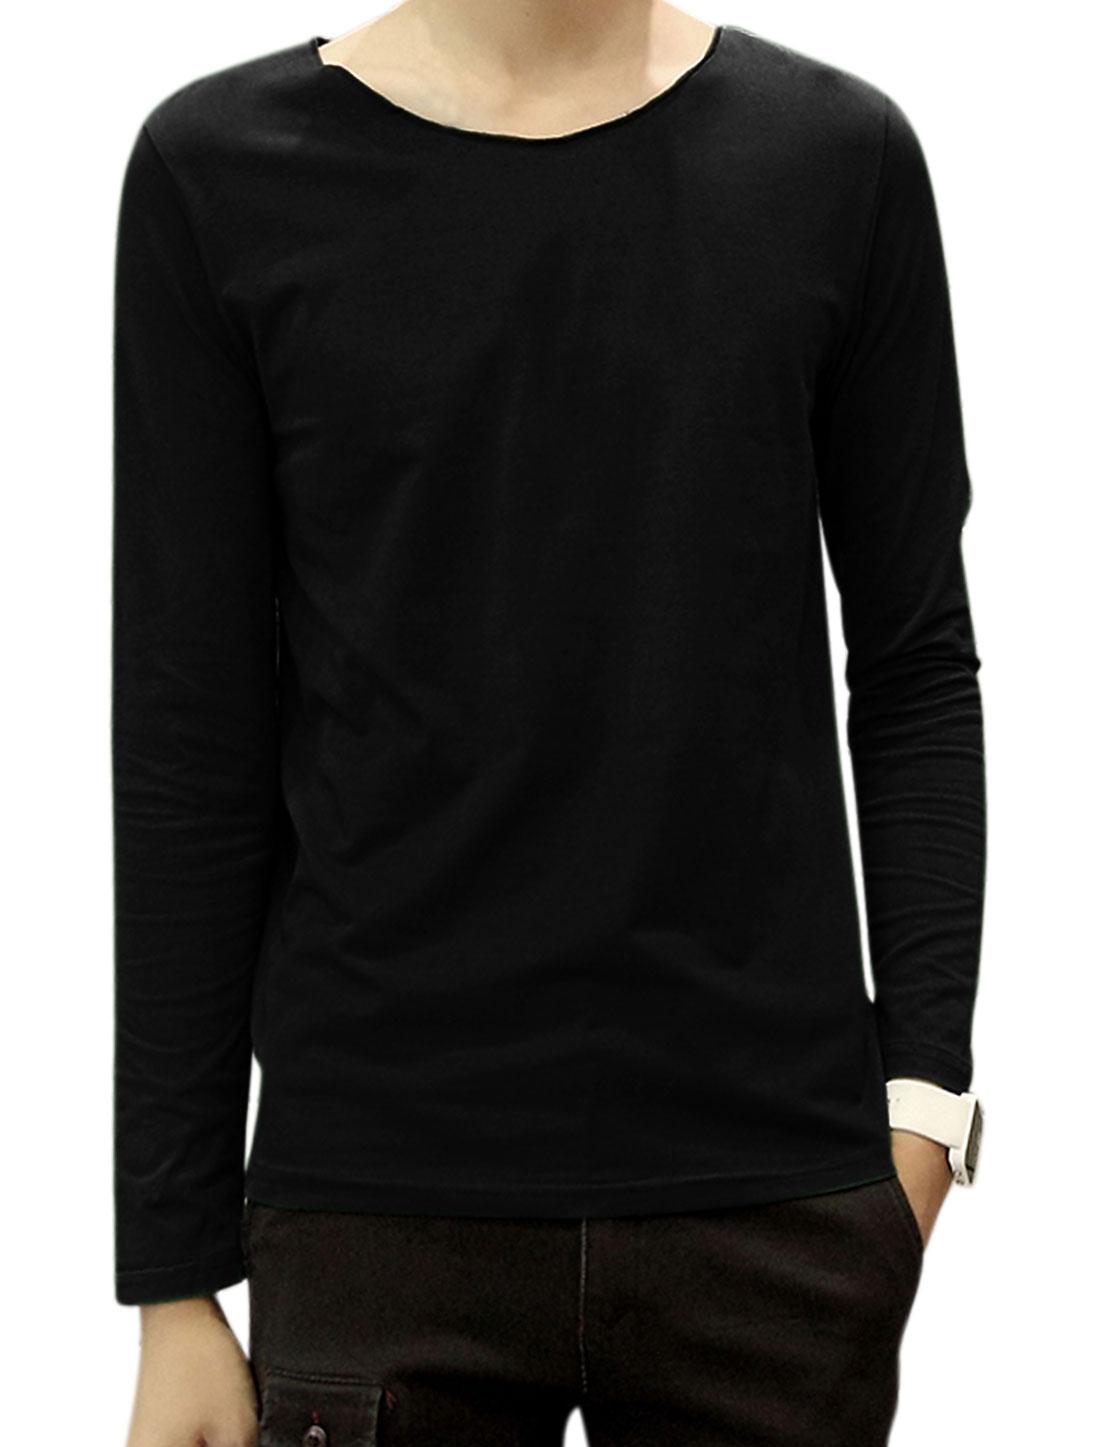 Men Raw Edge Neckline Long Sleeves Round Neck Tee Shirt Black M